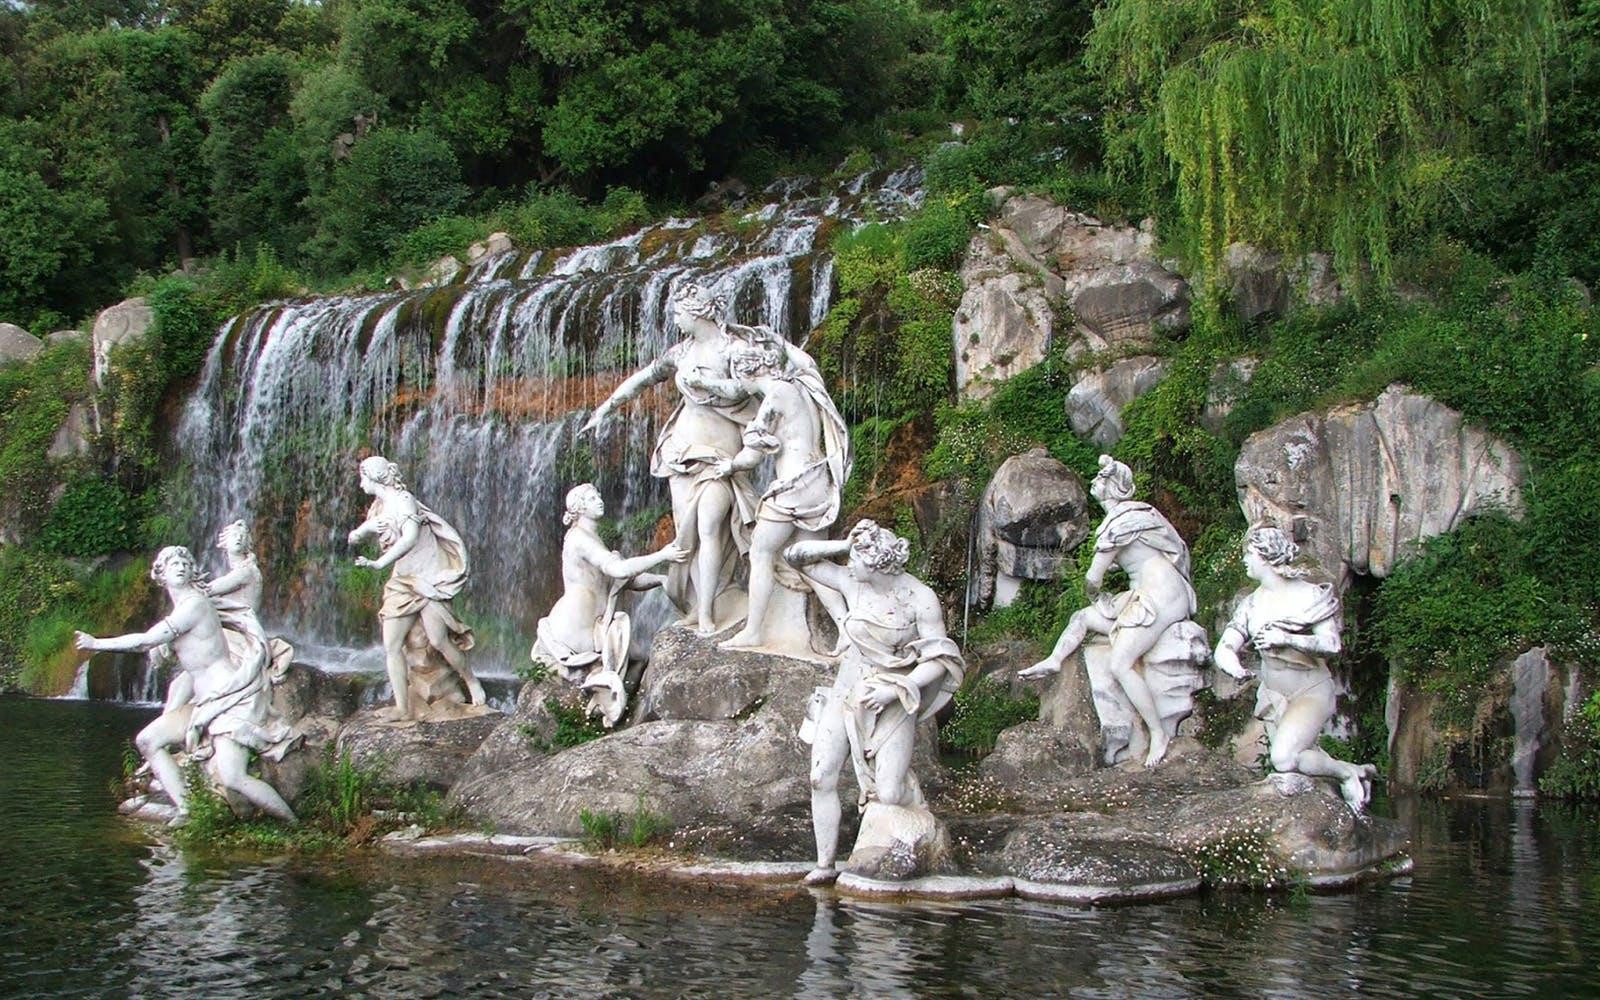 royal palace of Caserta garden